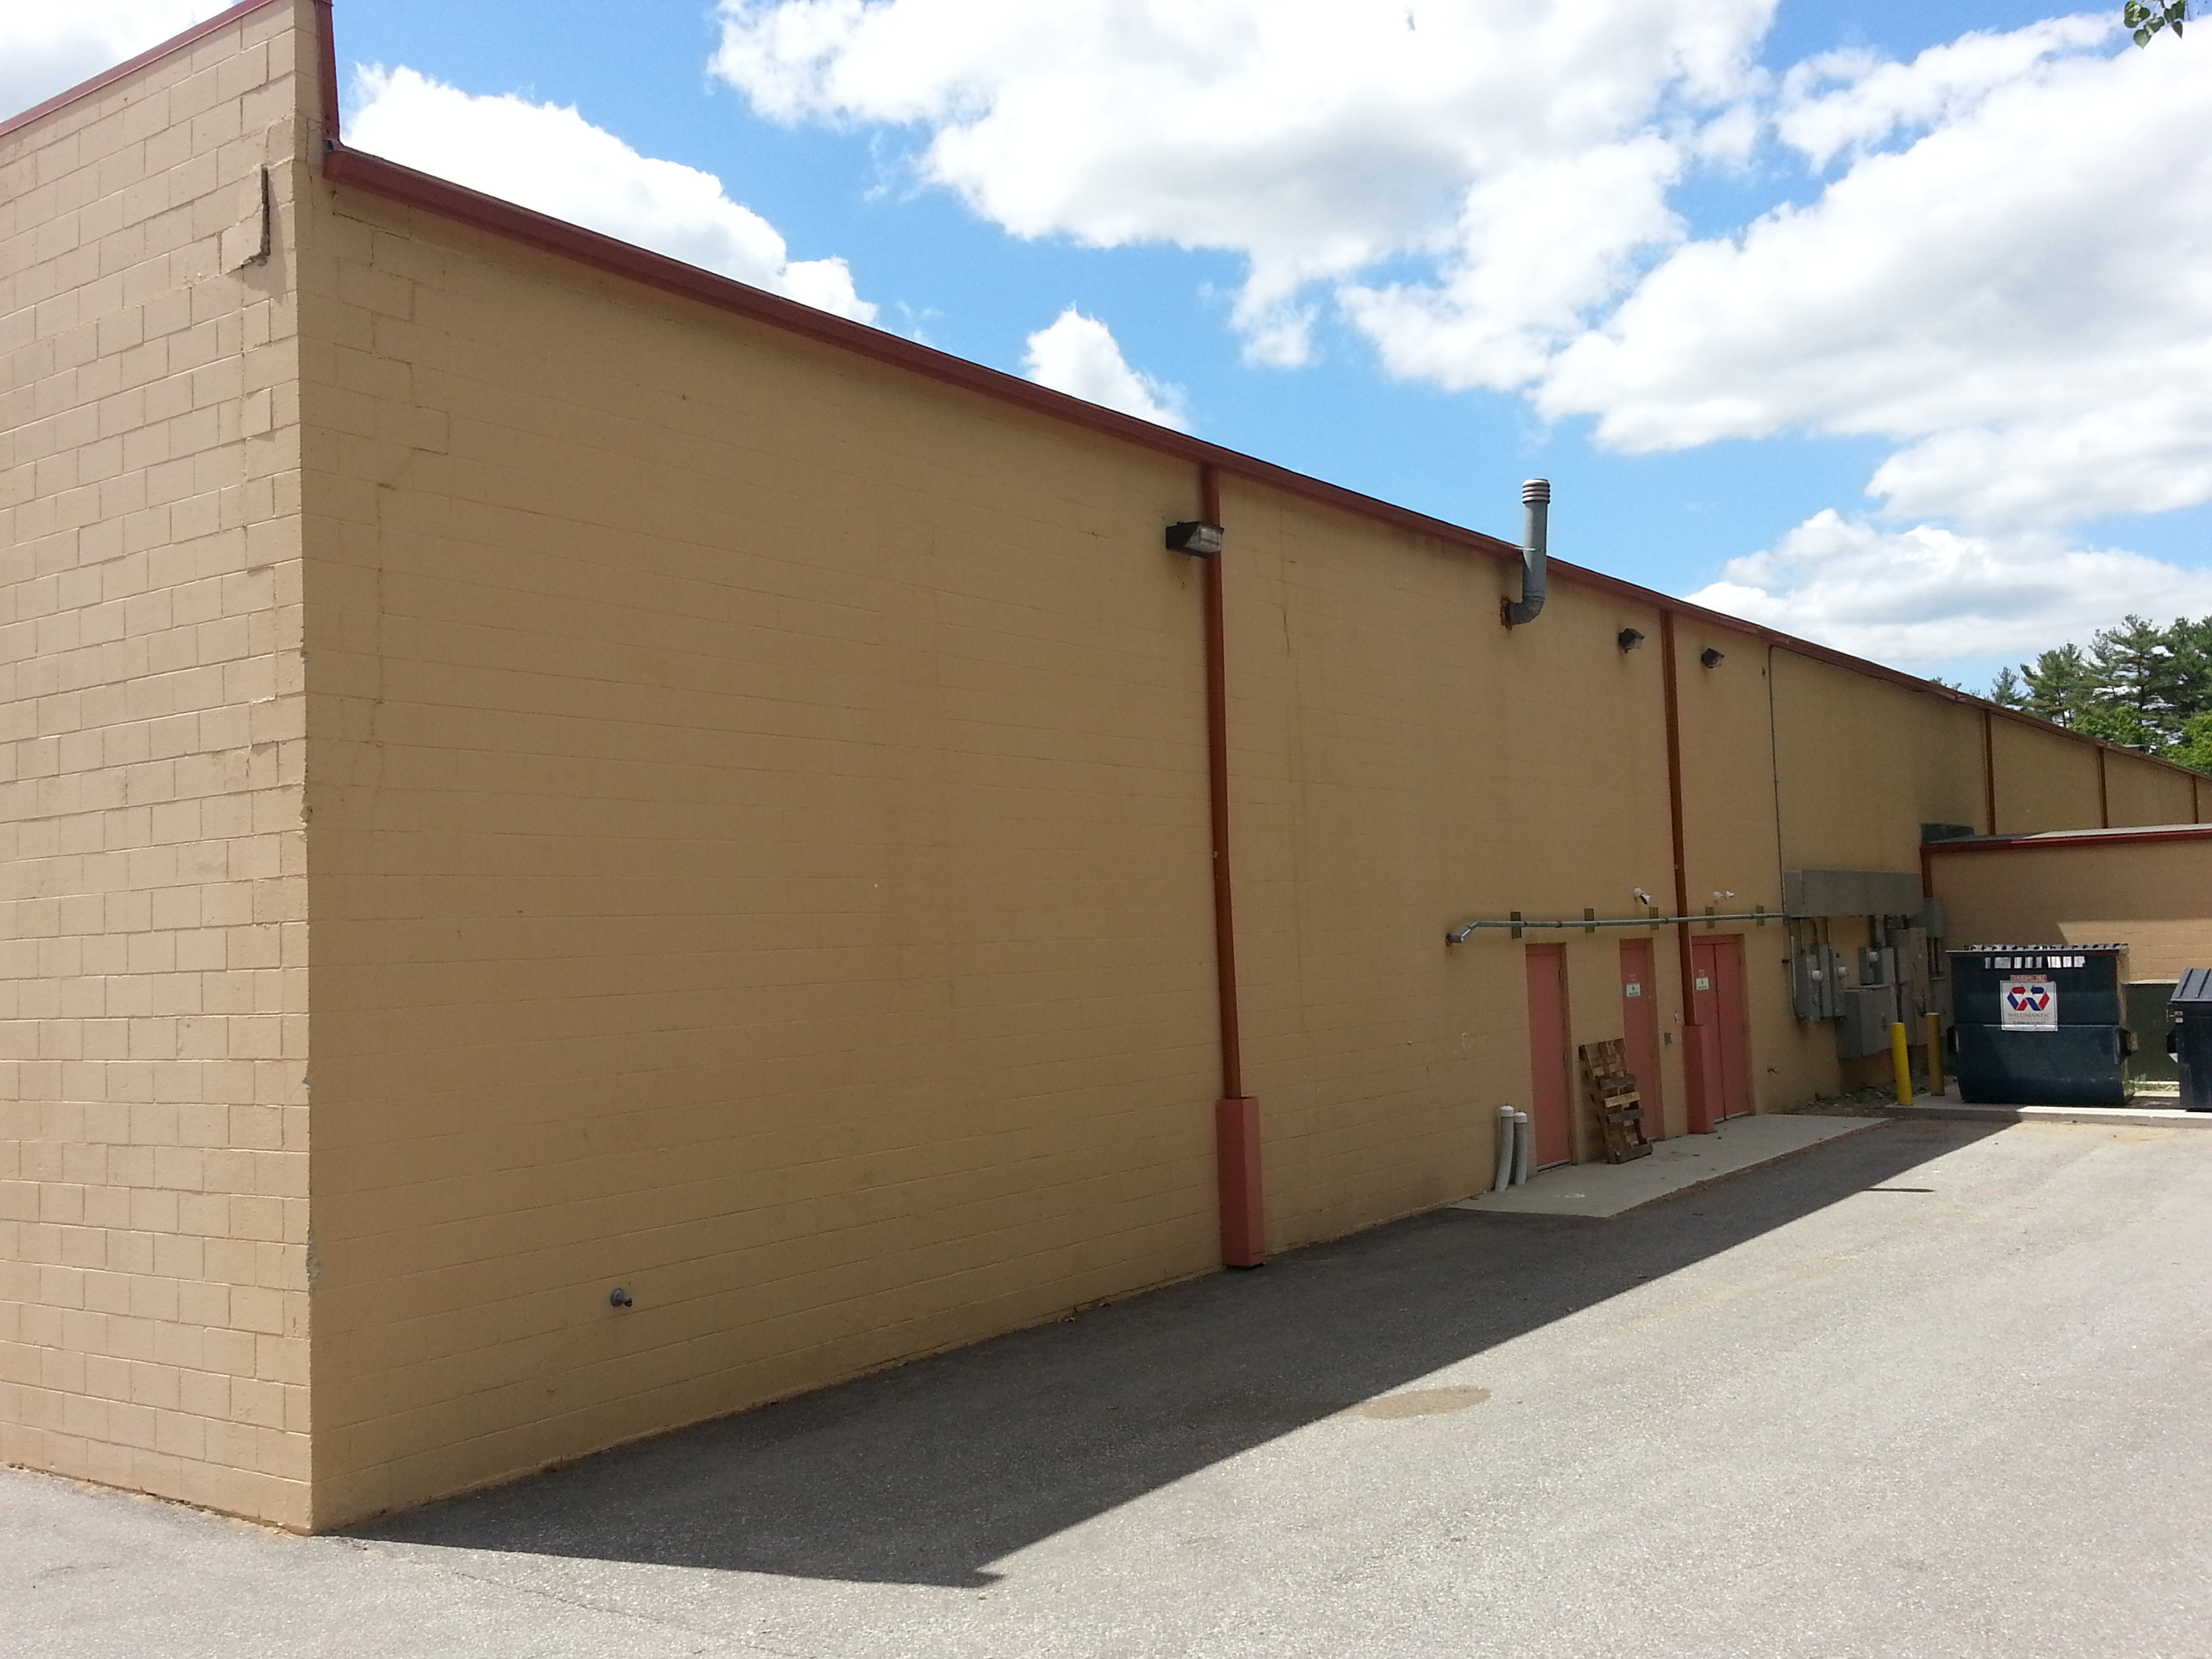 industrial gutter installation 6 inch gutter installation, commercial gutter iinstallation